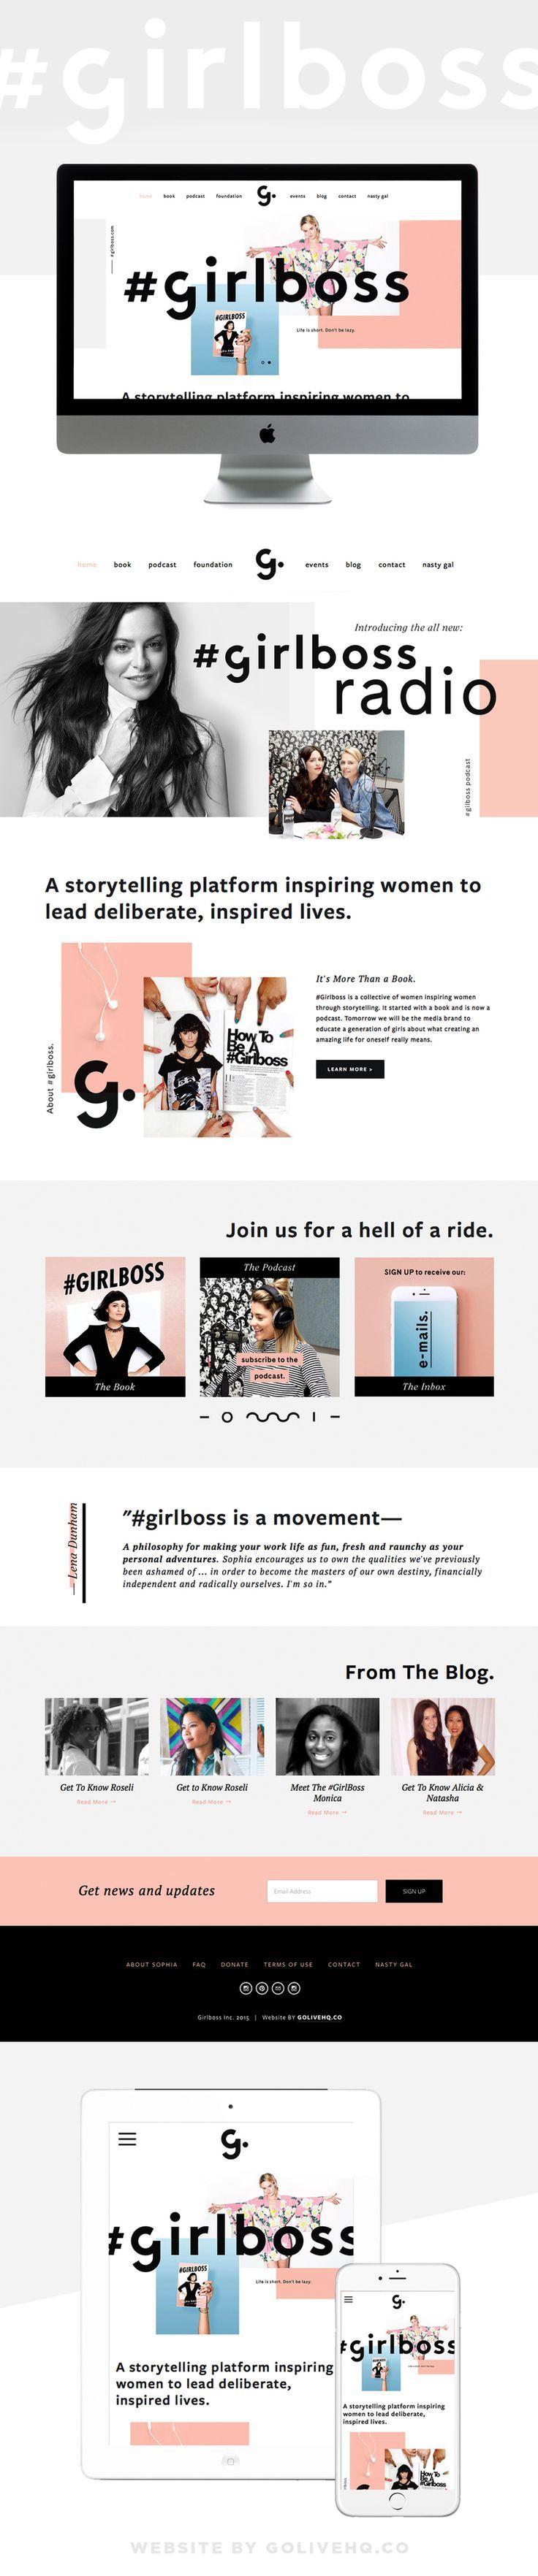 www.girlboss.com | by golivehq.co